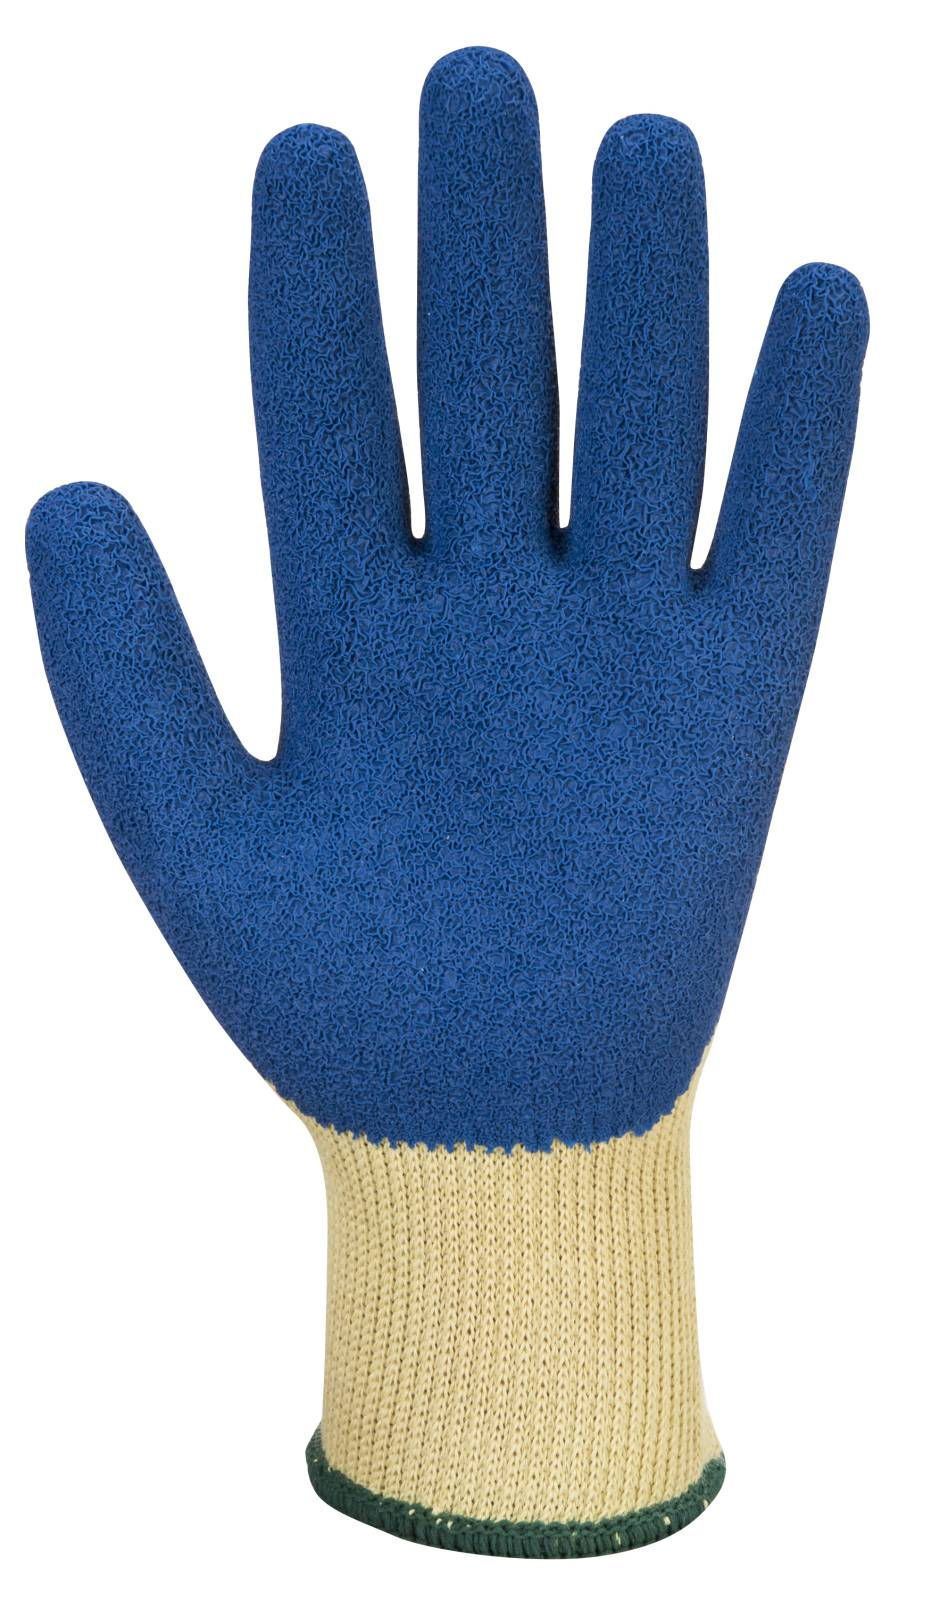 Portwest Handschoenen A610 geel-blauw(YB)